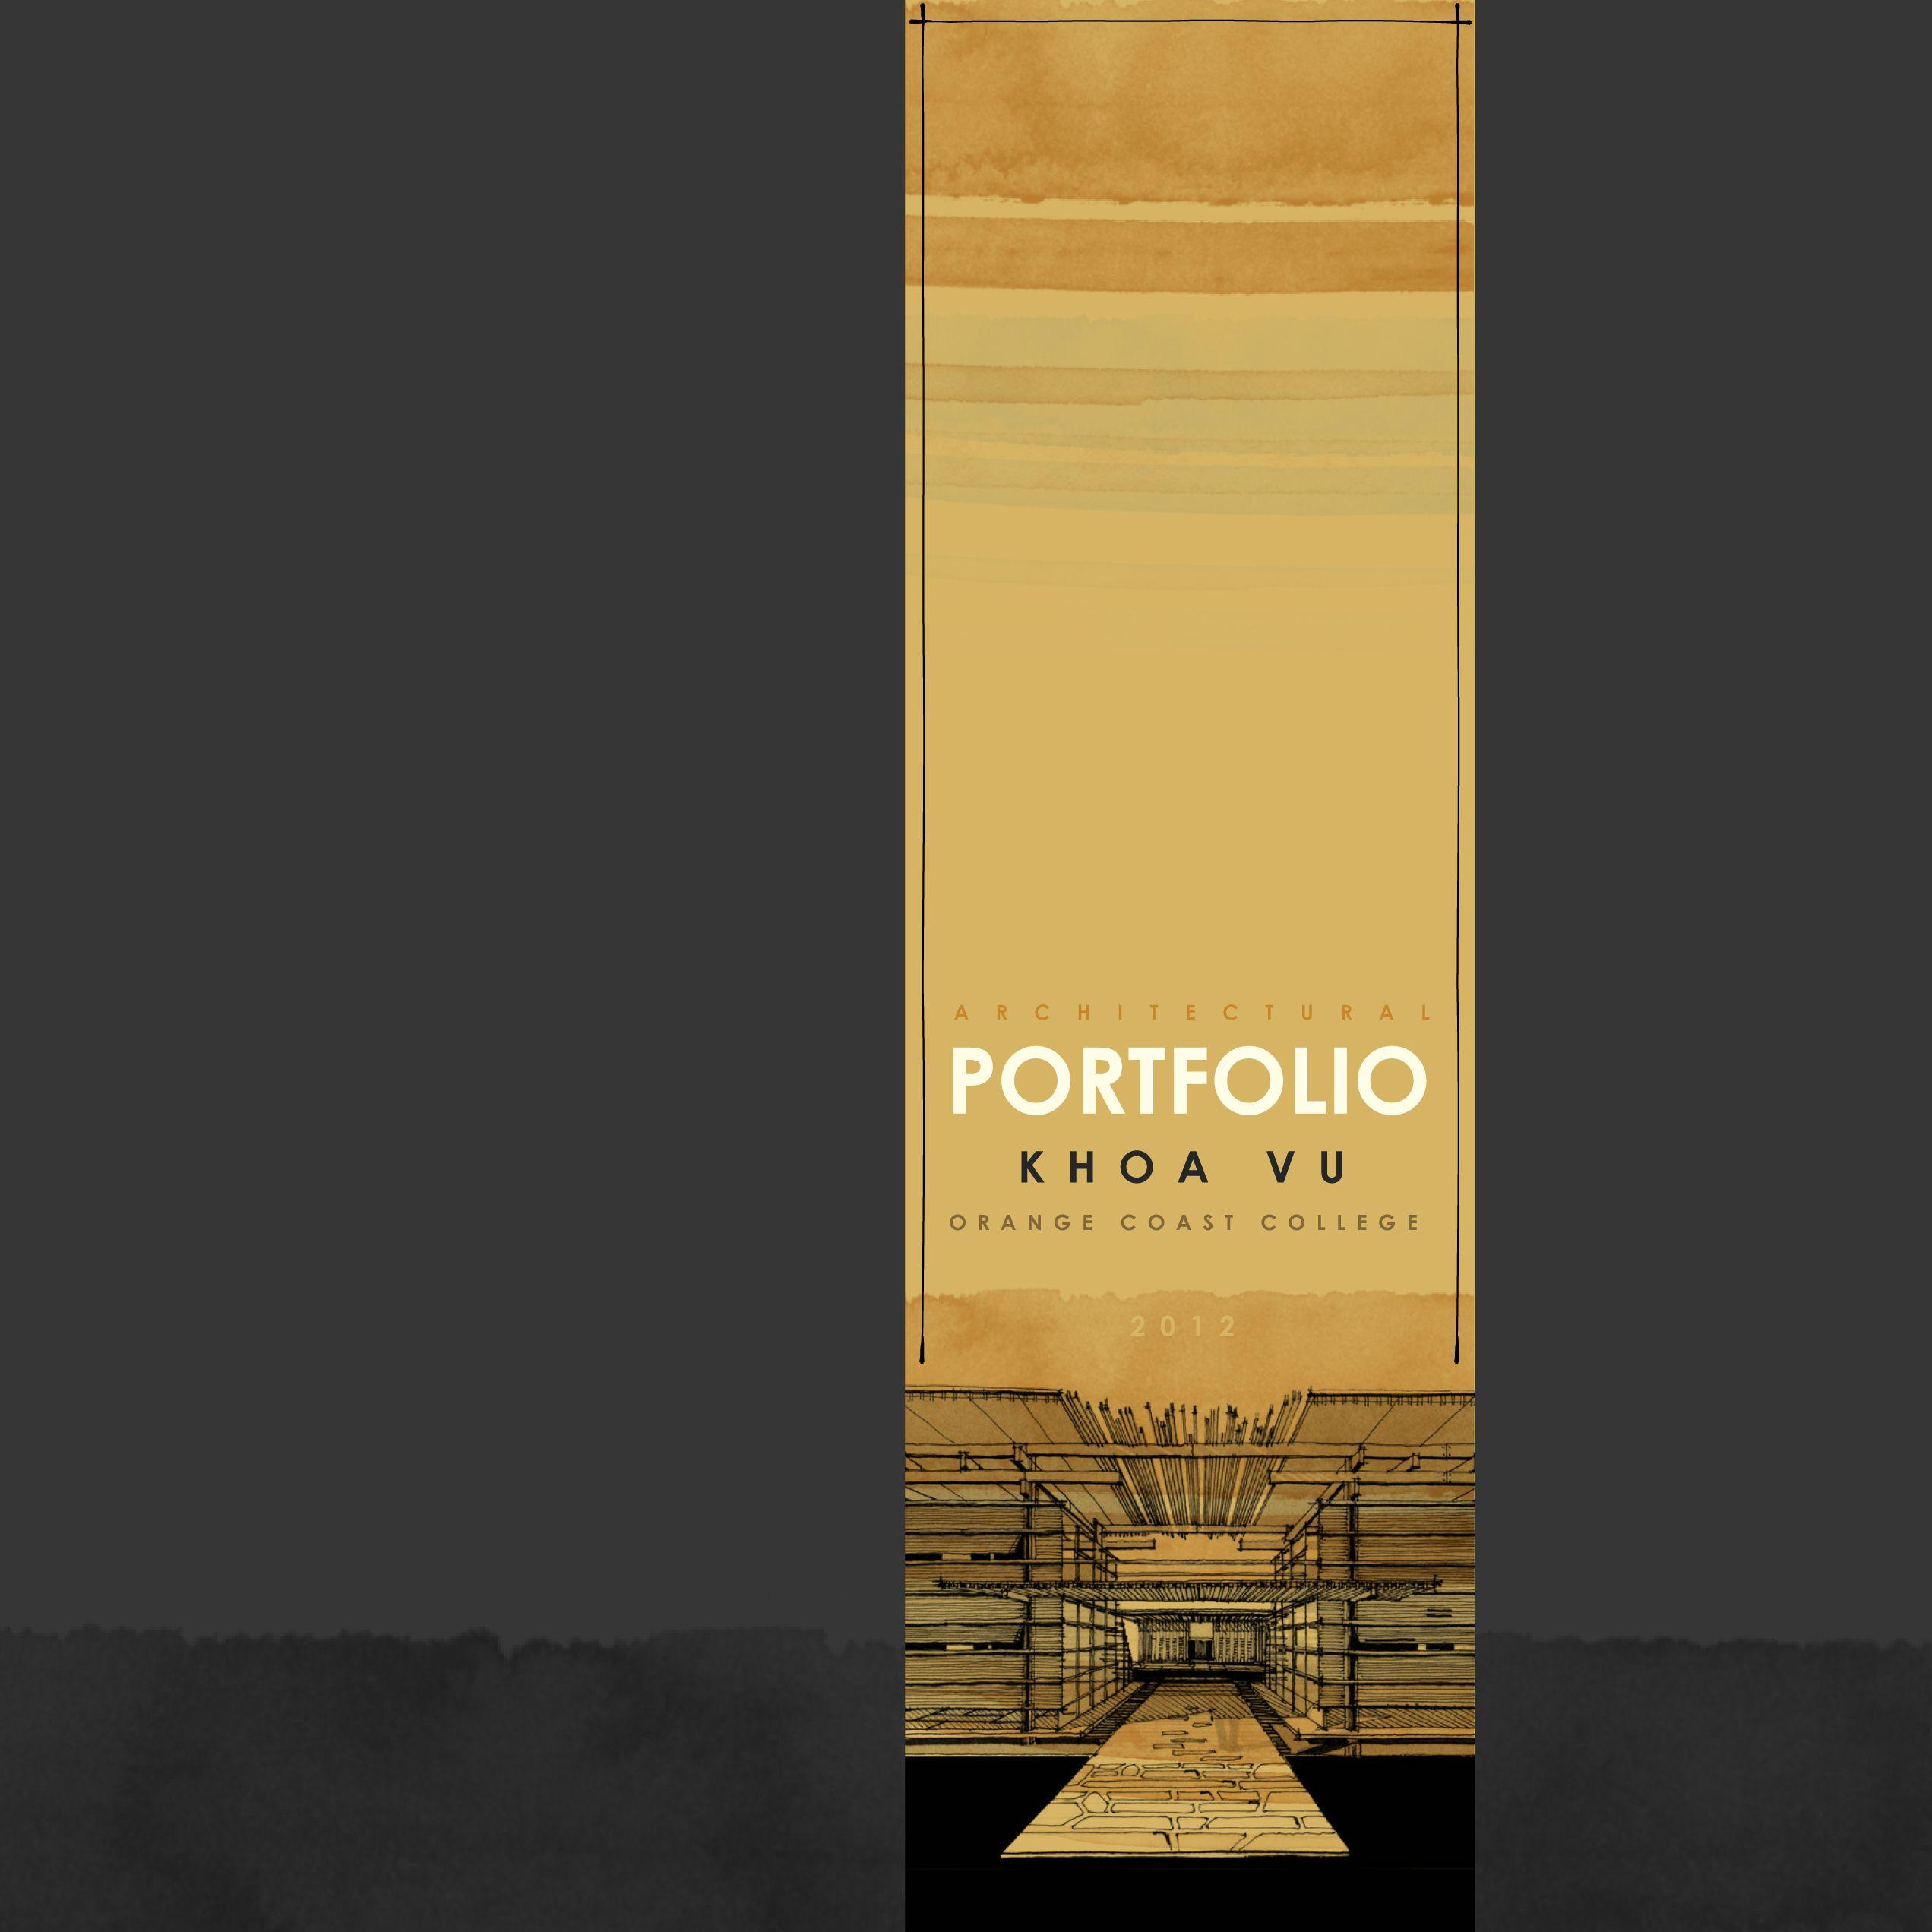 architecture portfolio cover google search ppt pinterest